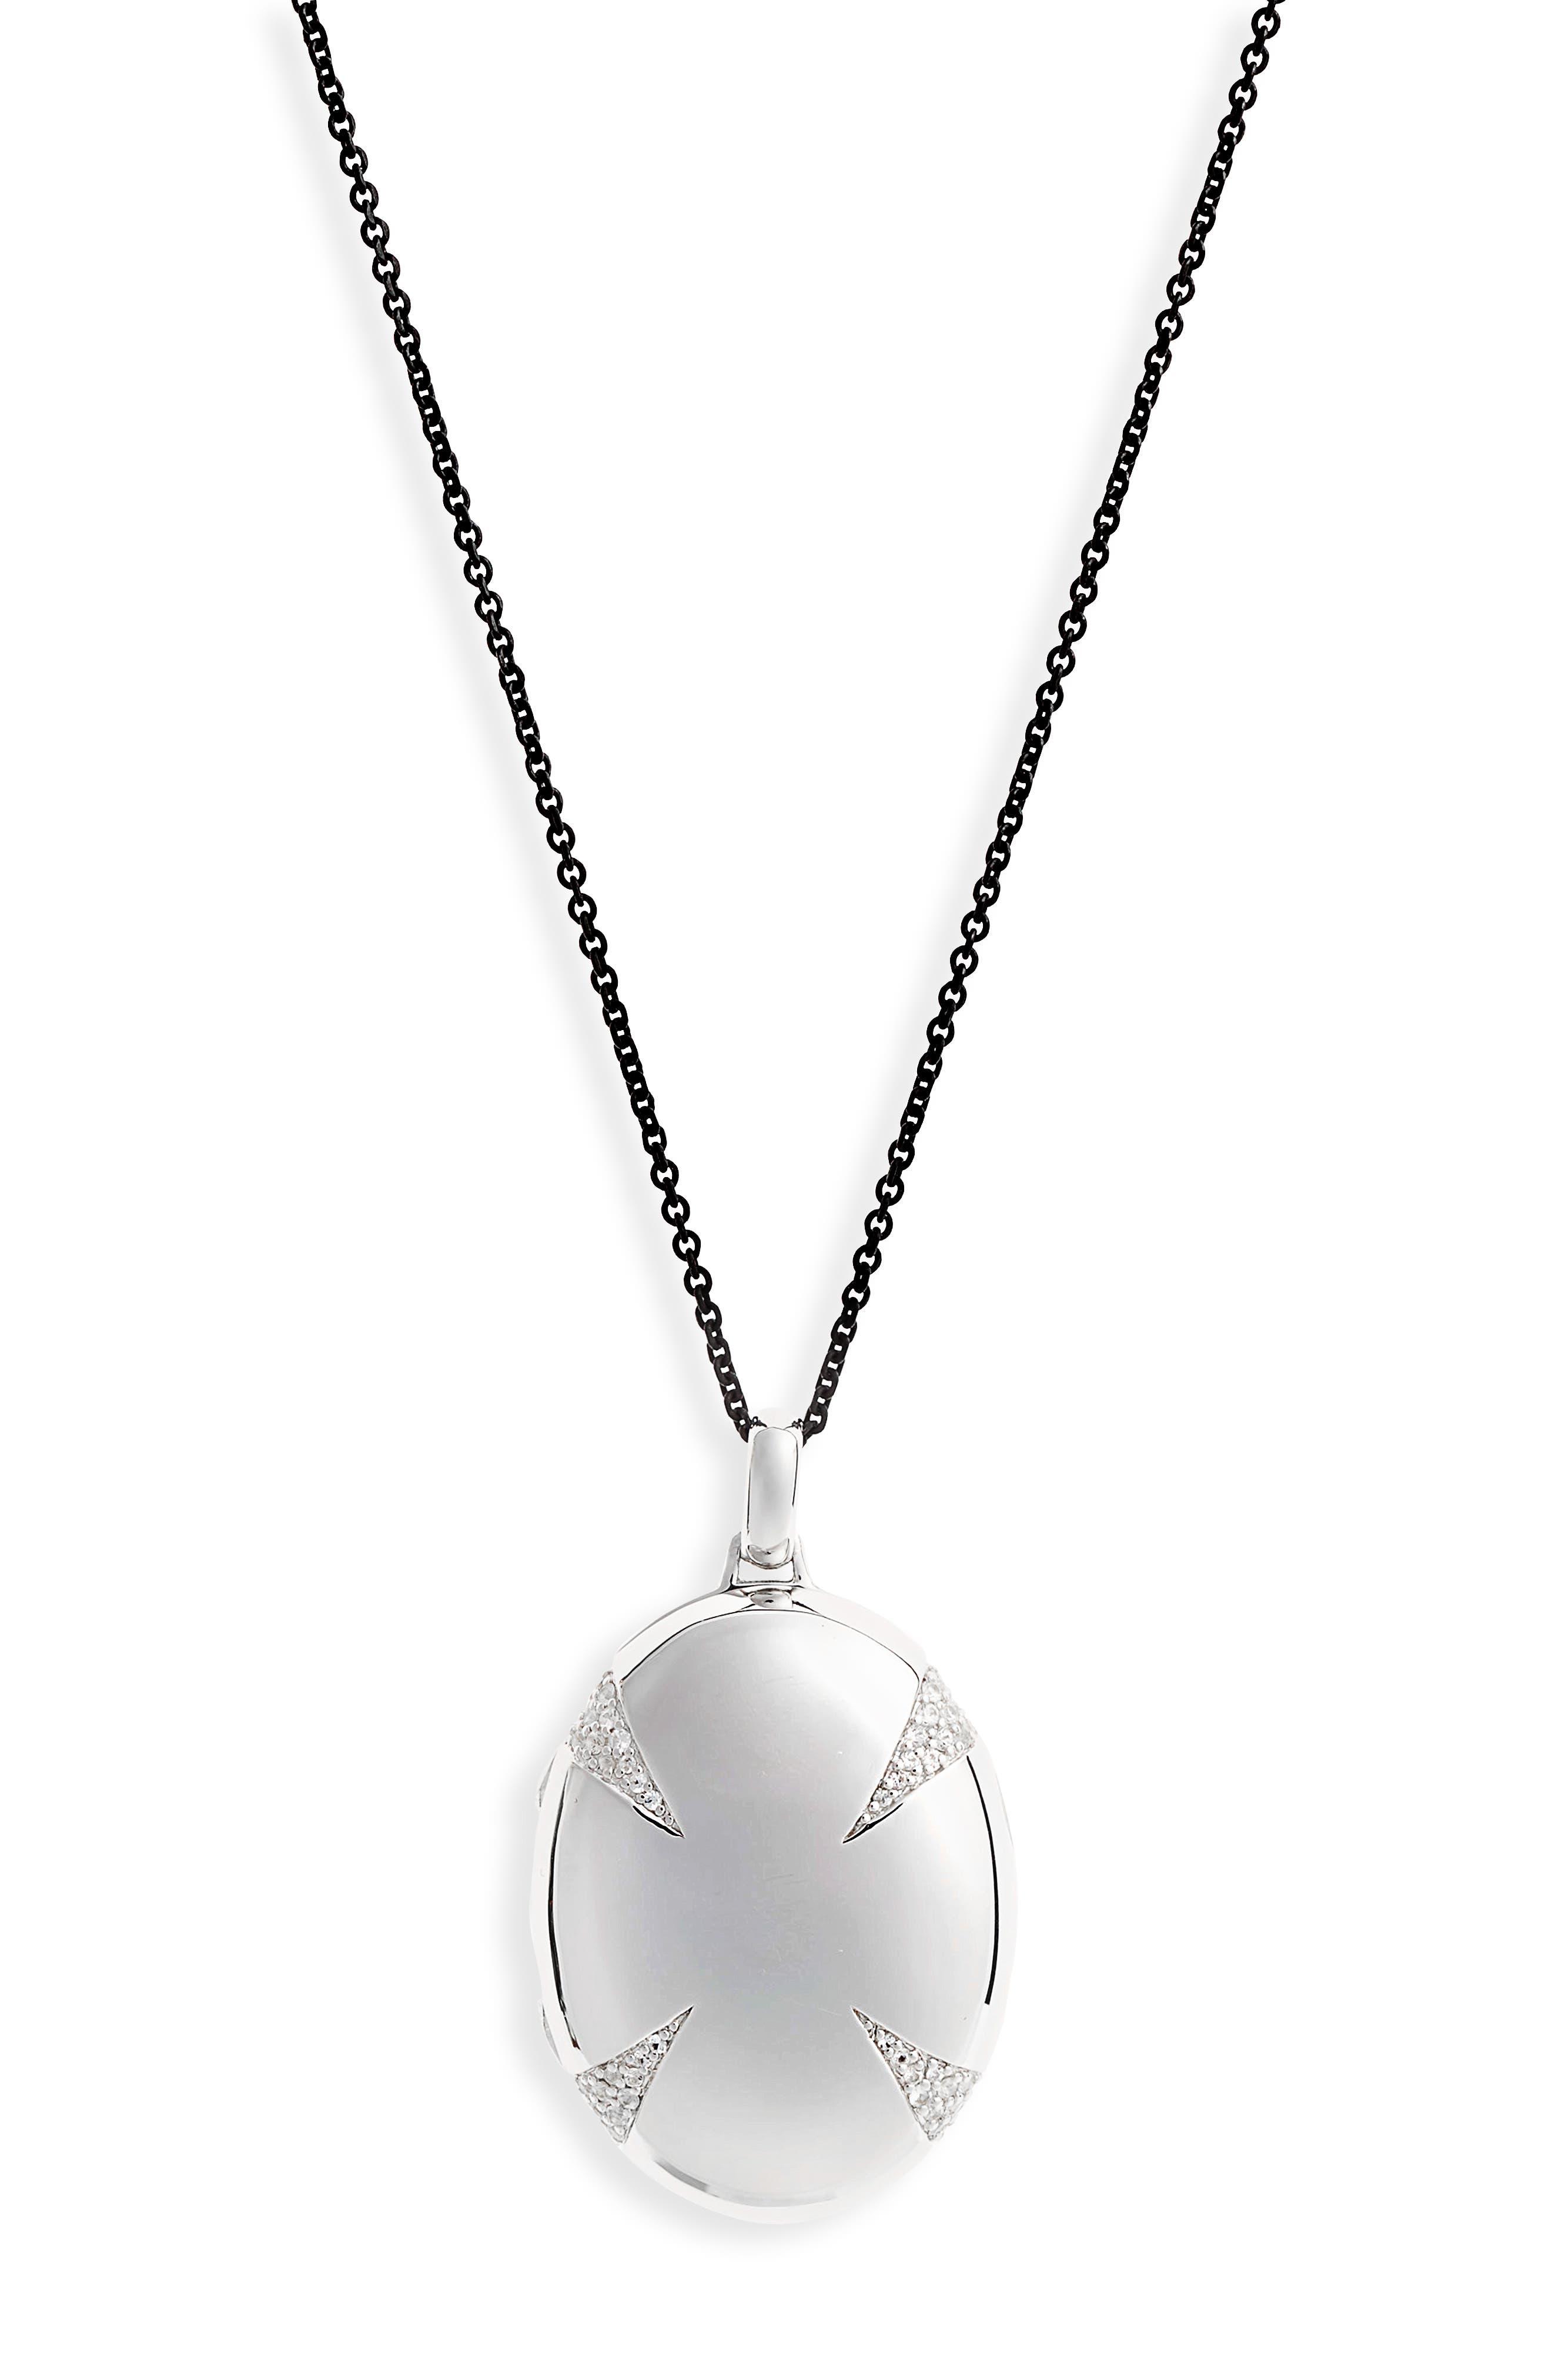 4-Image Locket Necklace,                             Alternate thumbnail 3, color,                             Sterling Silver